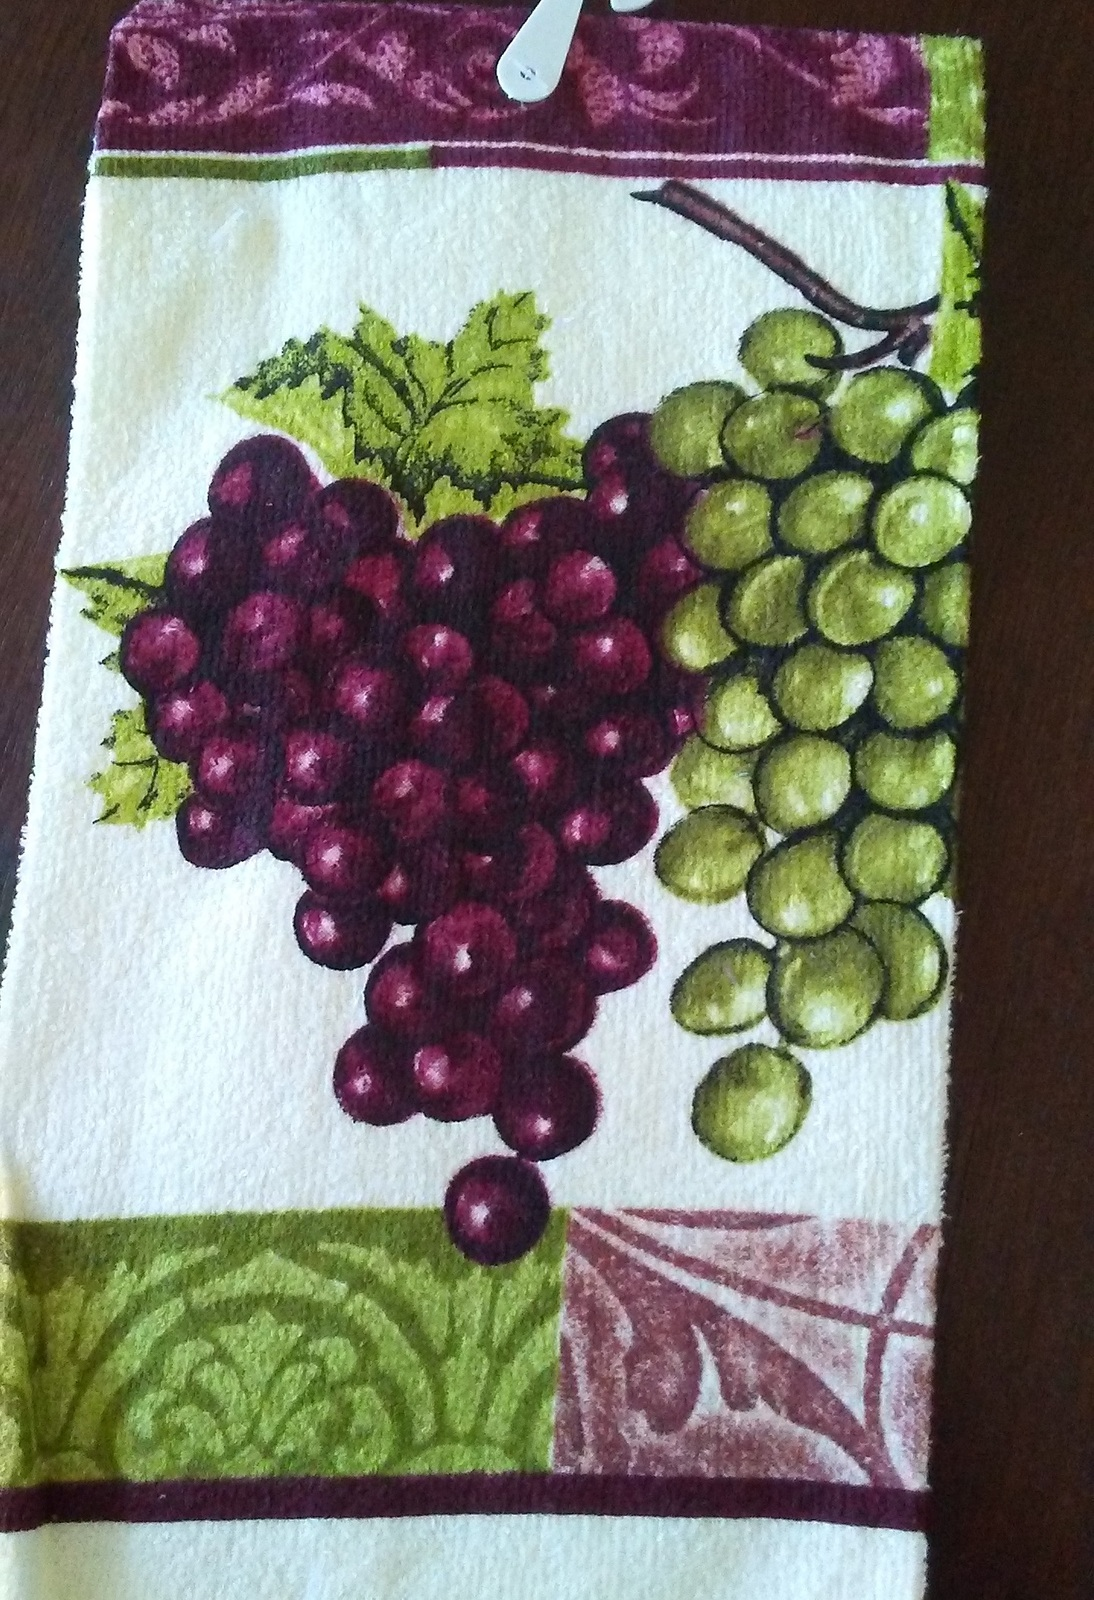 PURPLE GRAPES KITCHEN SET 5-pc Potholders Oven Mitt Towels Wine Grape Vine NEW